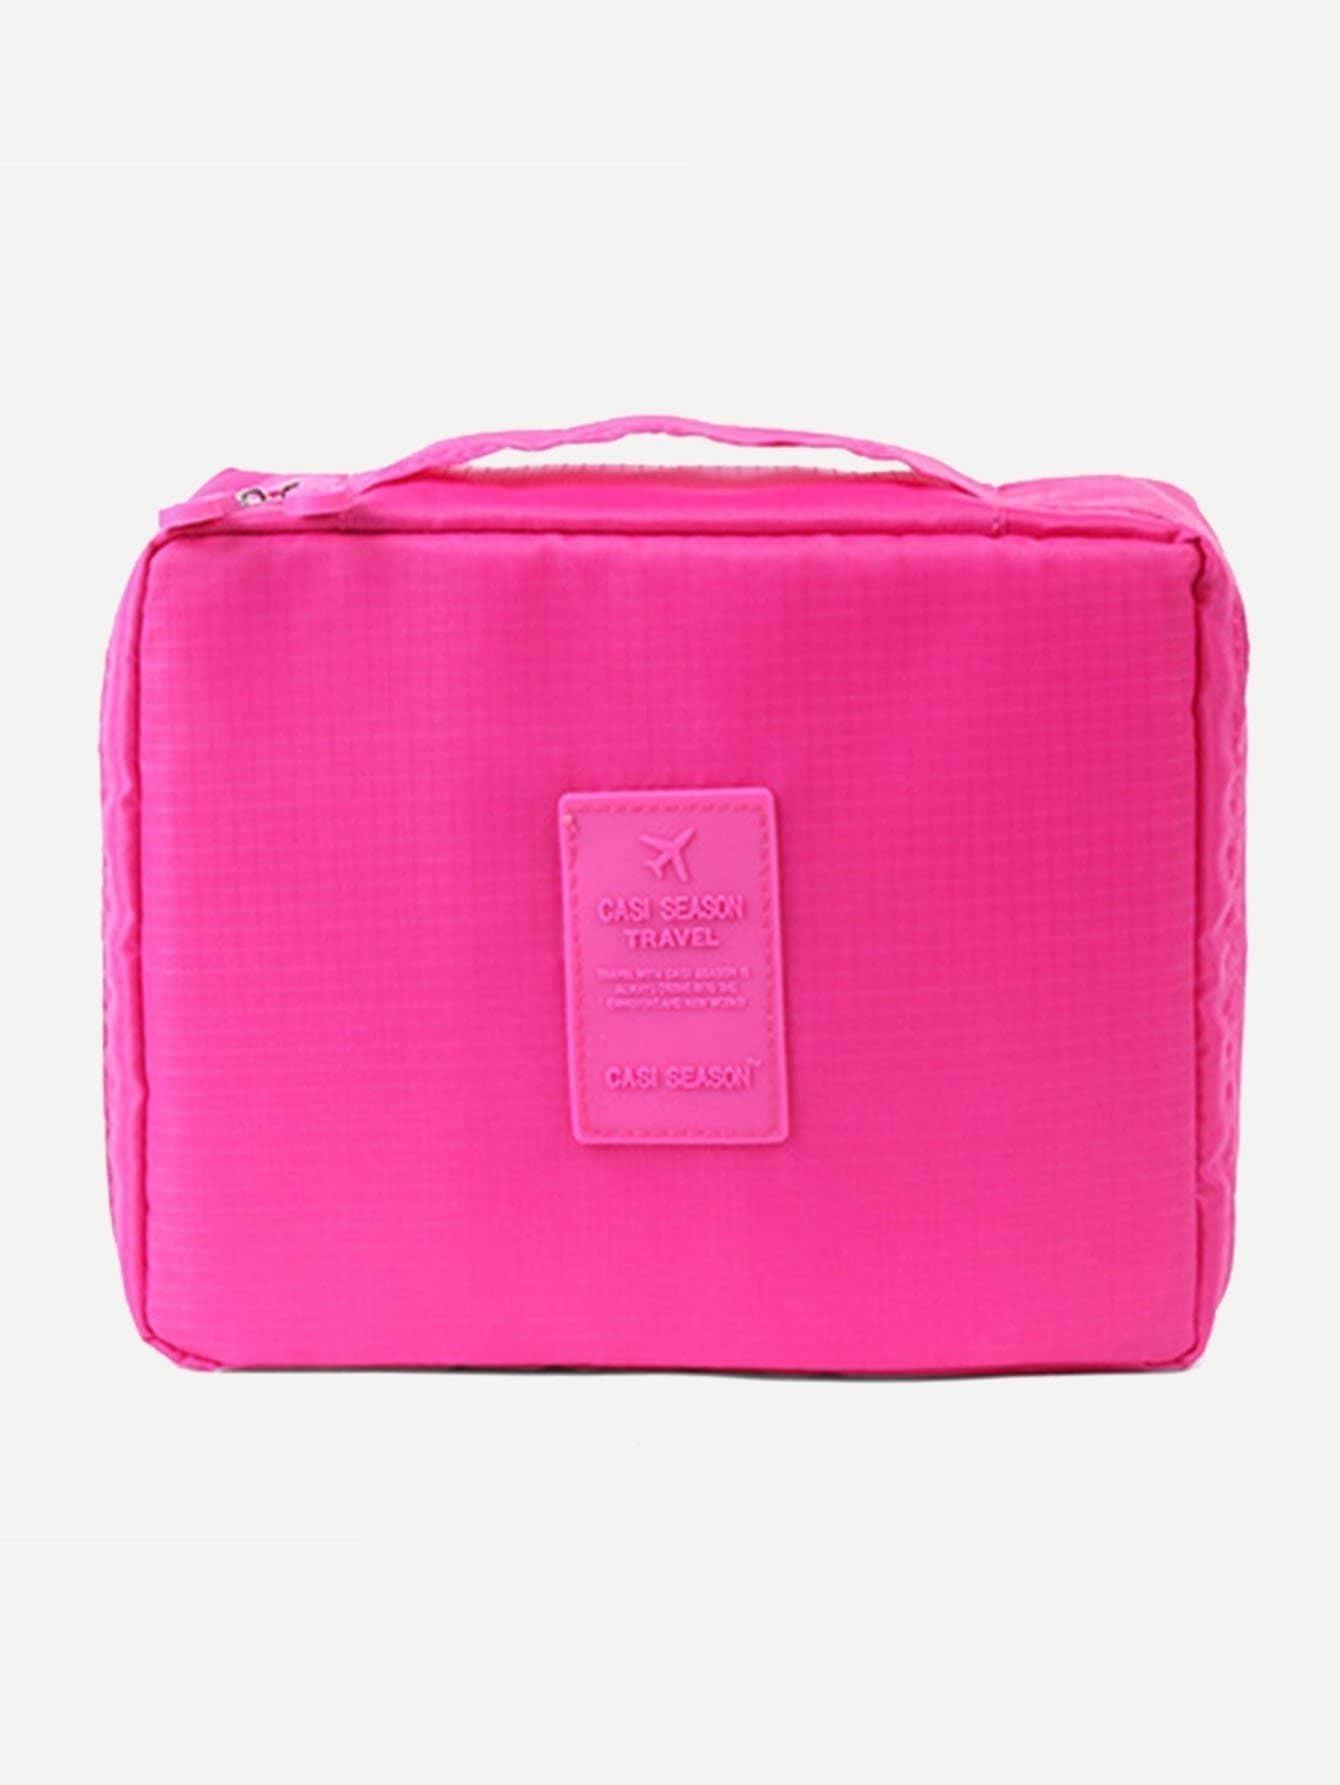 Фото Makeup Organizer Bag makeup organizer travel bag women cosmetic bags summer dumpling clutch women packages waterproof cosmetic bag handbag